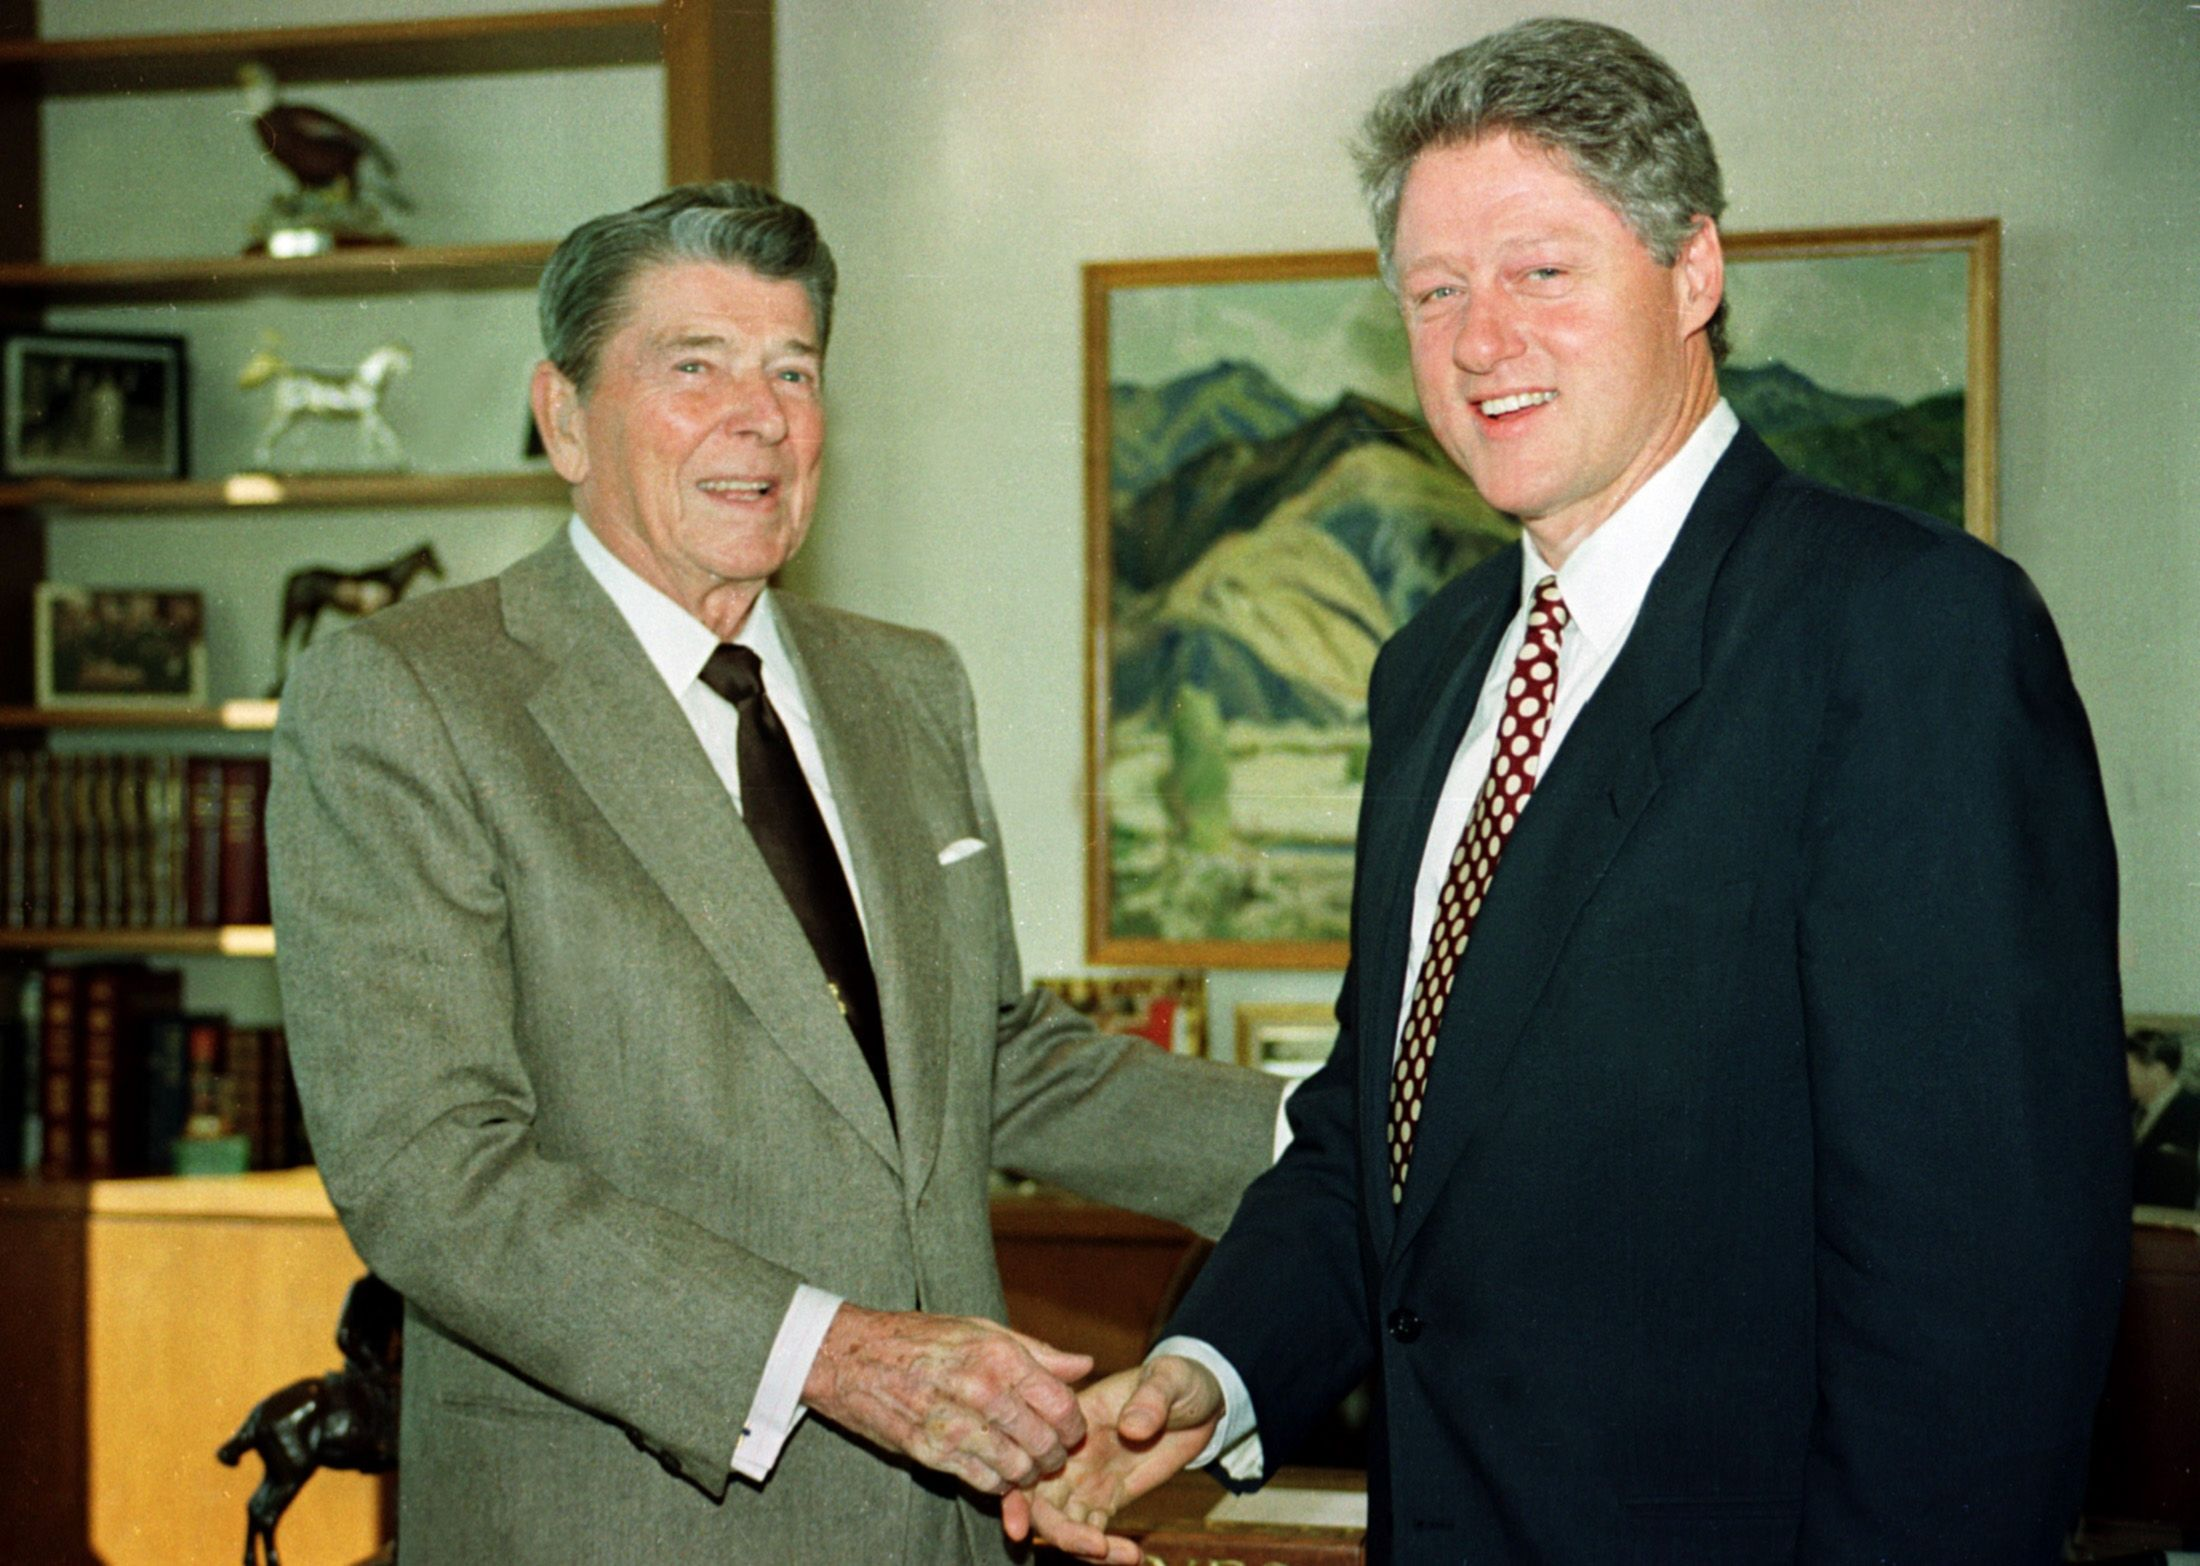 Hindsight Helps Make Sense of the Clintons' Presidency